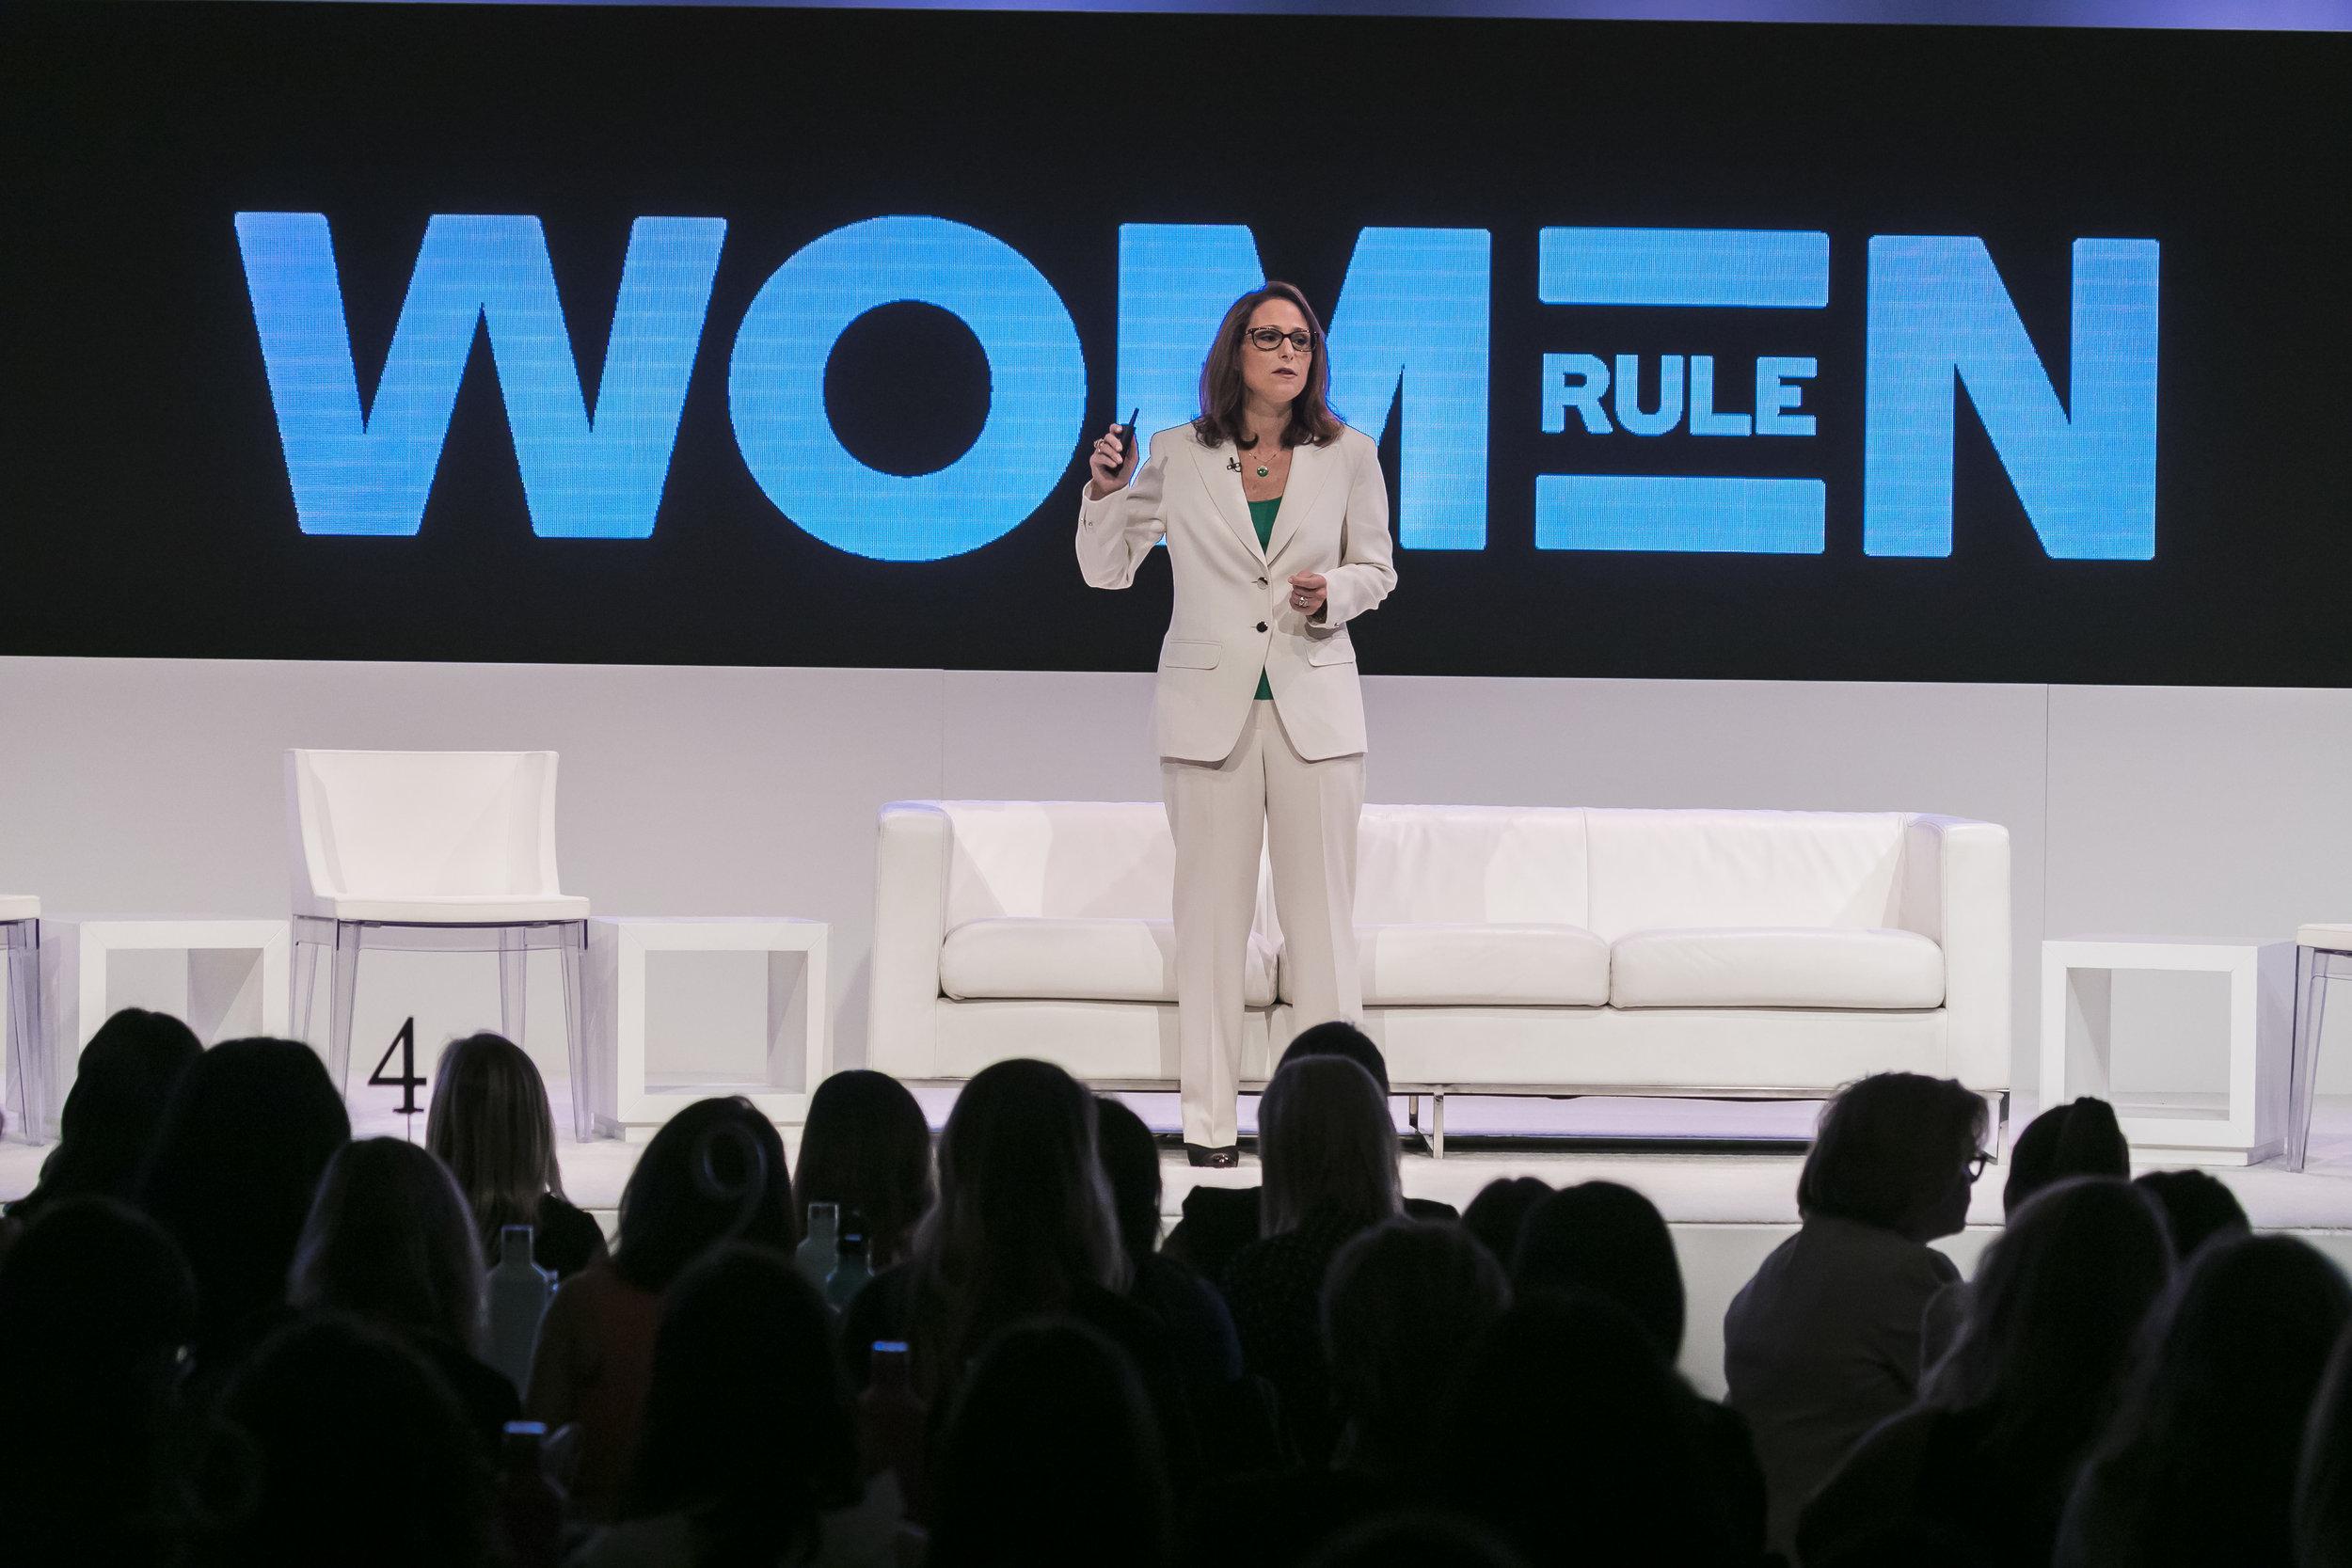 20180605-politicowomenrule-losangeles-ca-0160-1.JPG